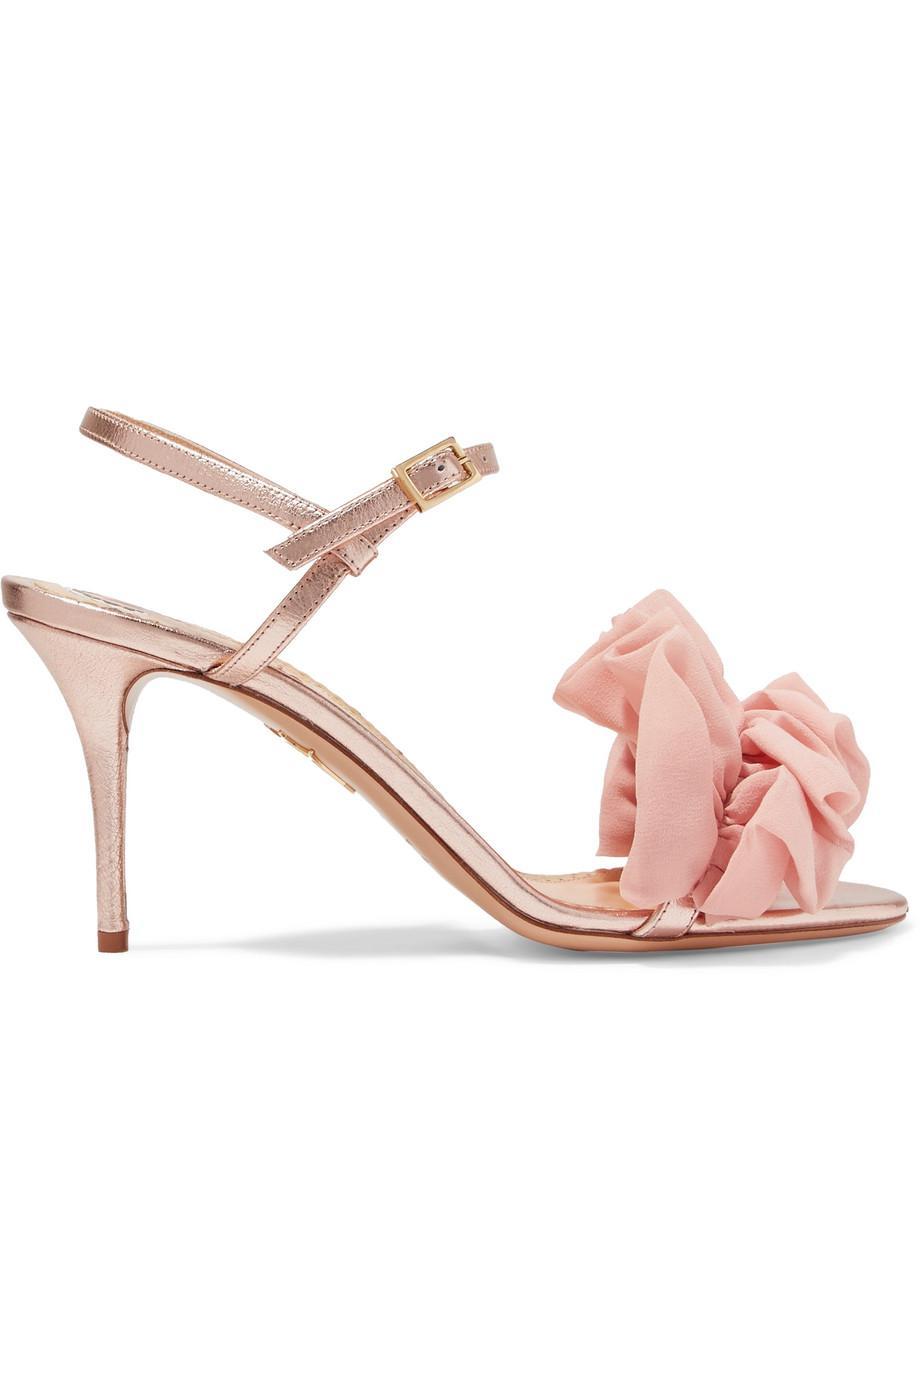 Reia Chiffon-trimmed Metallic Textured-leather Sandals - Pink Charlotte Olympia xHZxZQlj